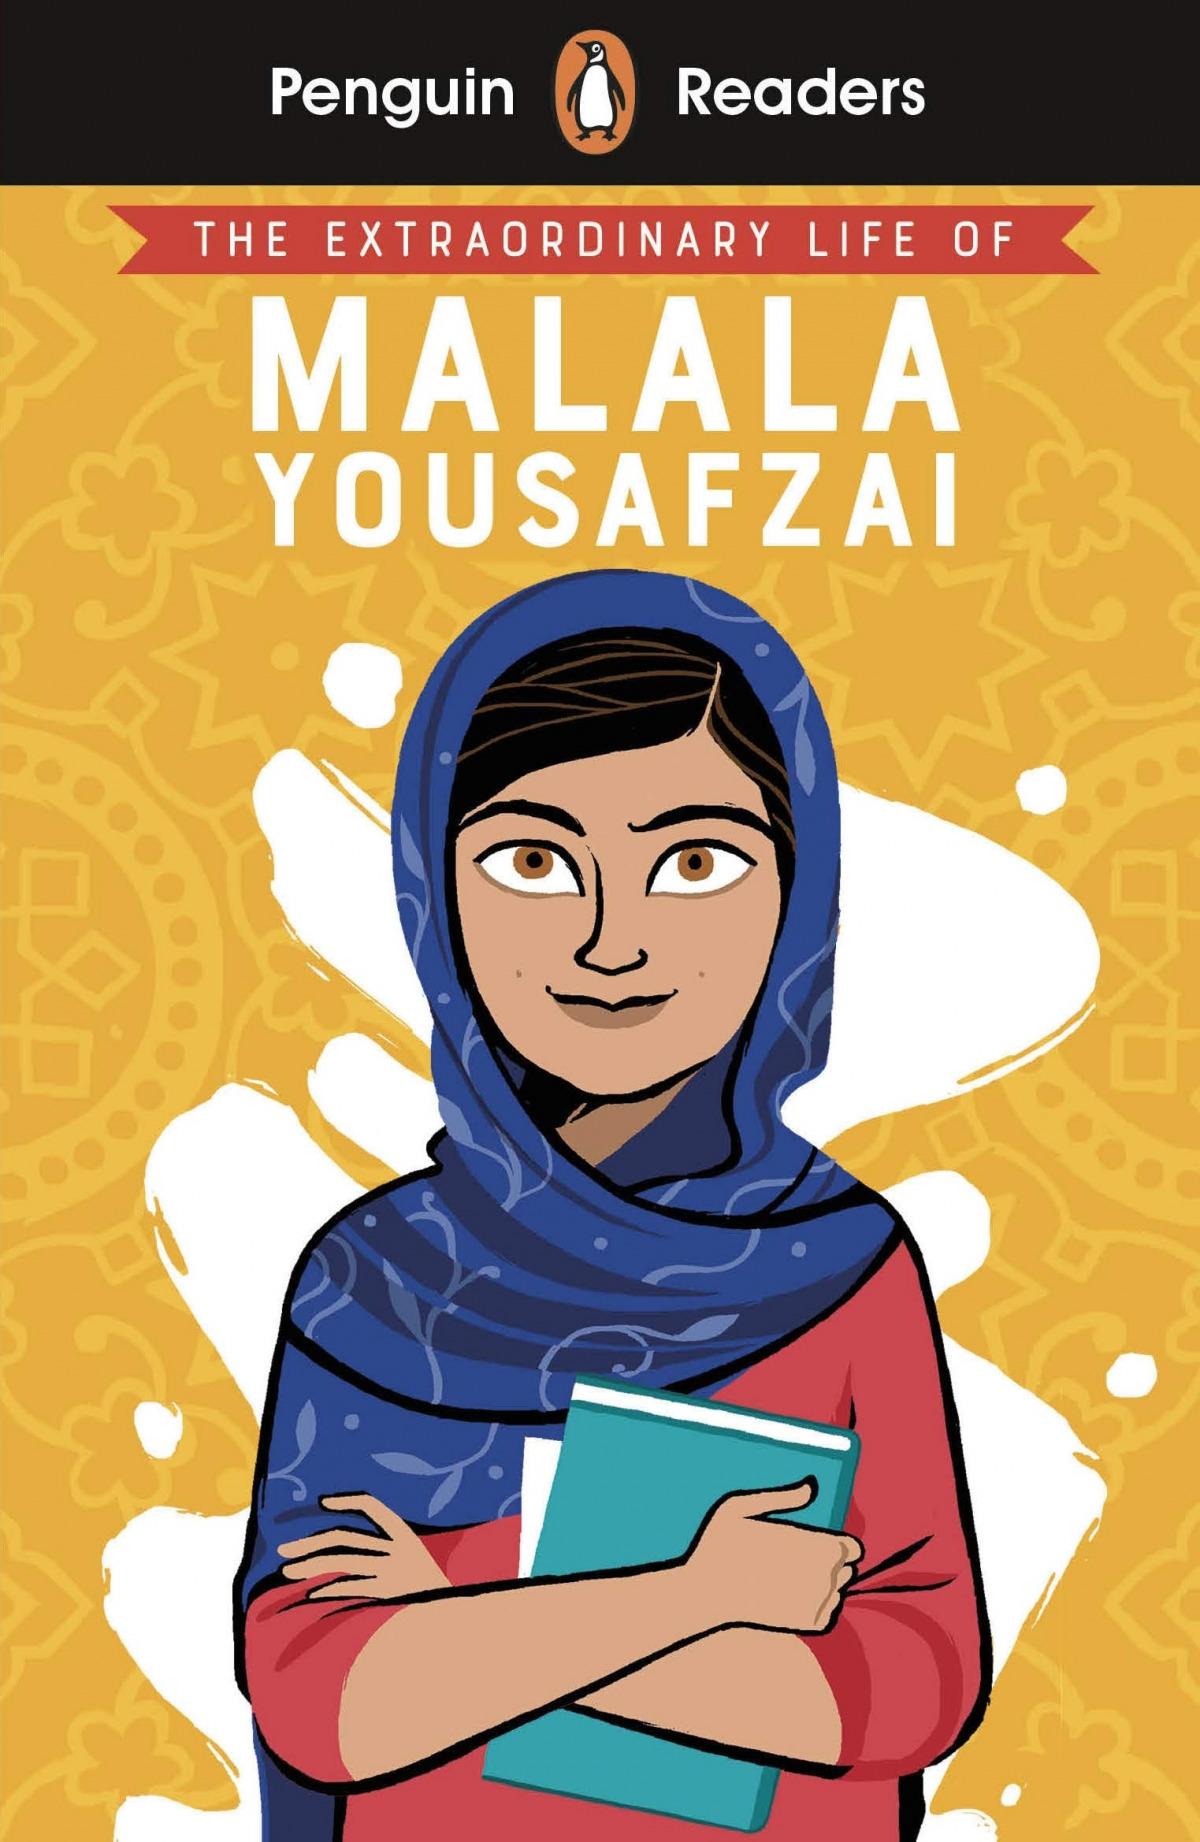 THE EXTRAORDINARY LIFE OF MALALA YOUSAFZAI PR L2